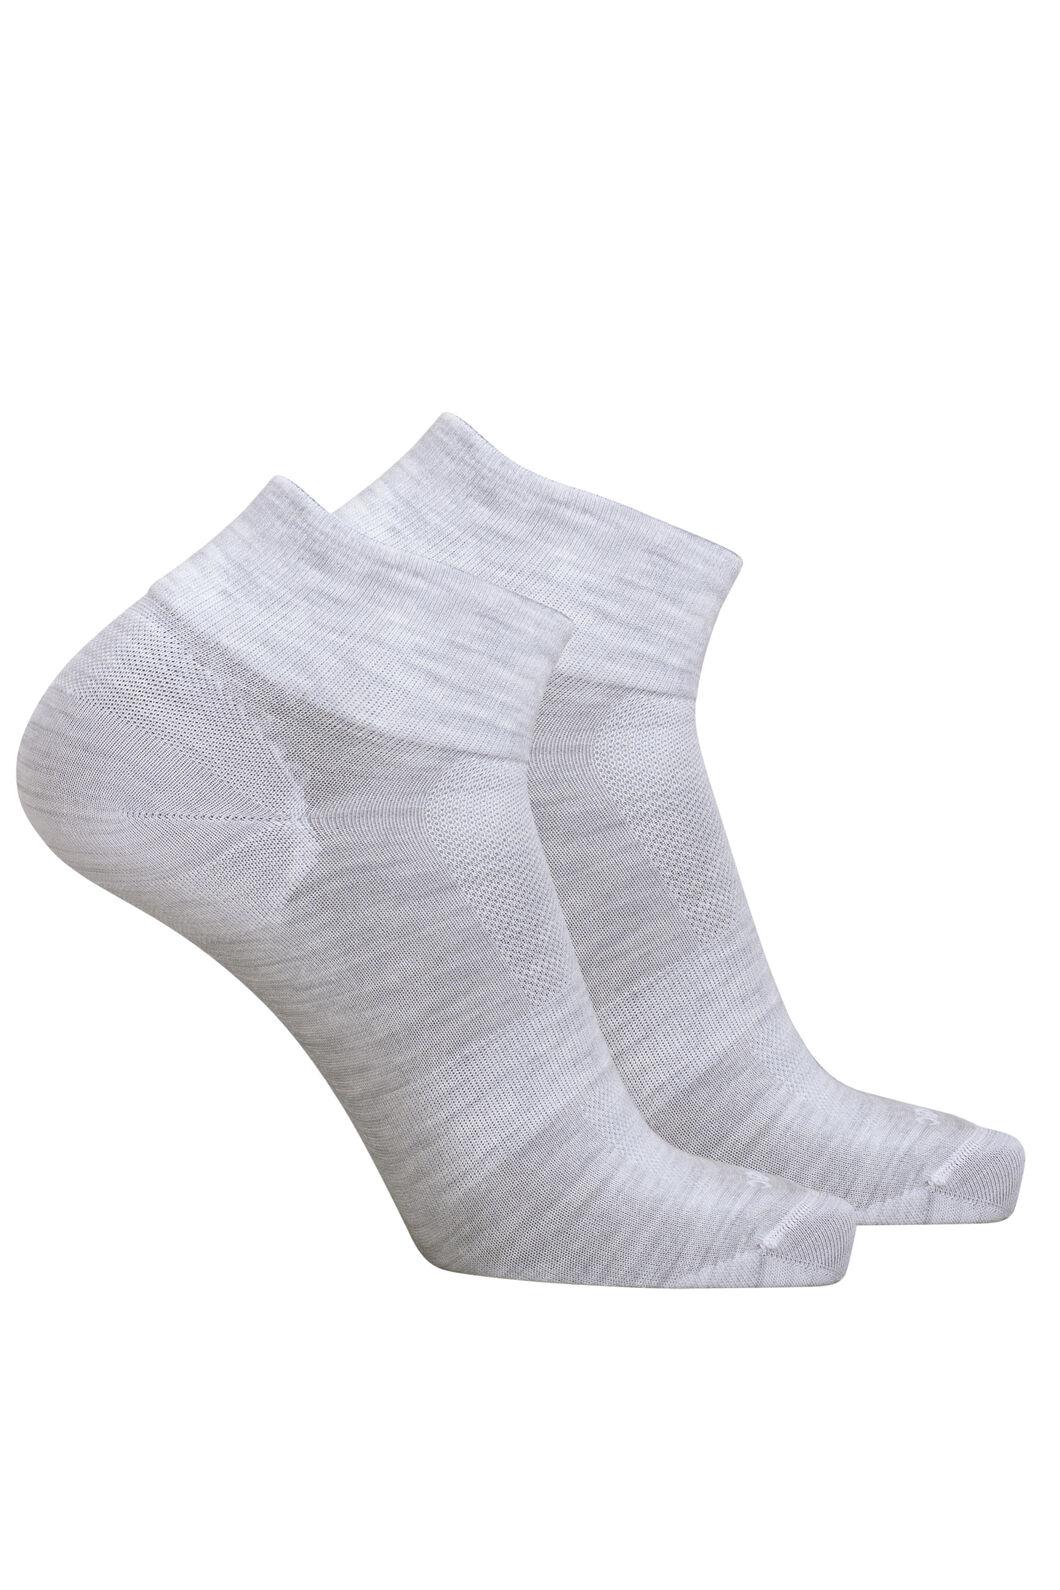 Macpac Merino Blend Quarter Socks — 2 Pack, Light Grey Marle, hi-res